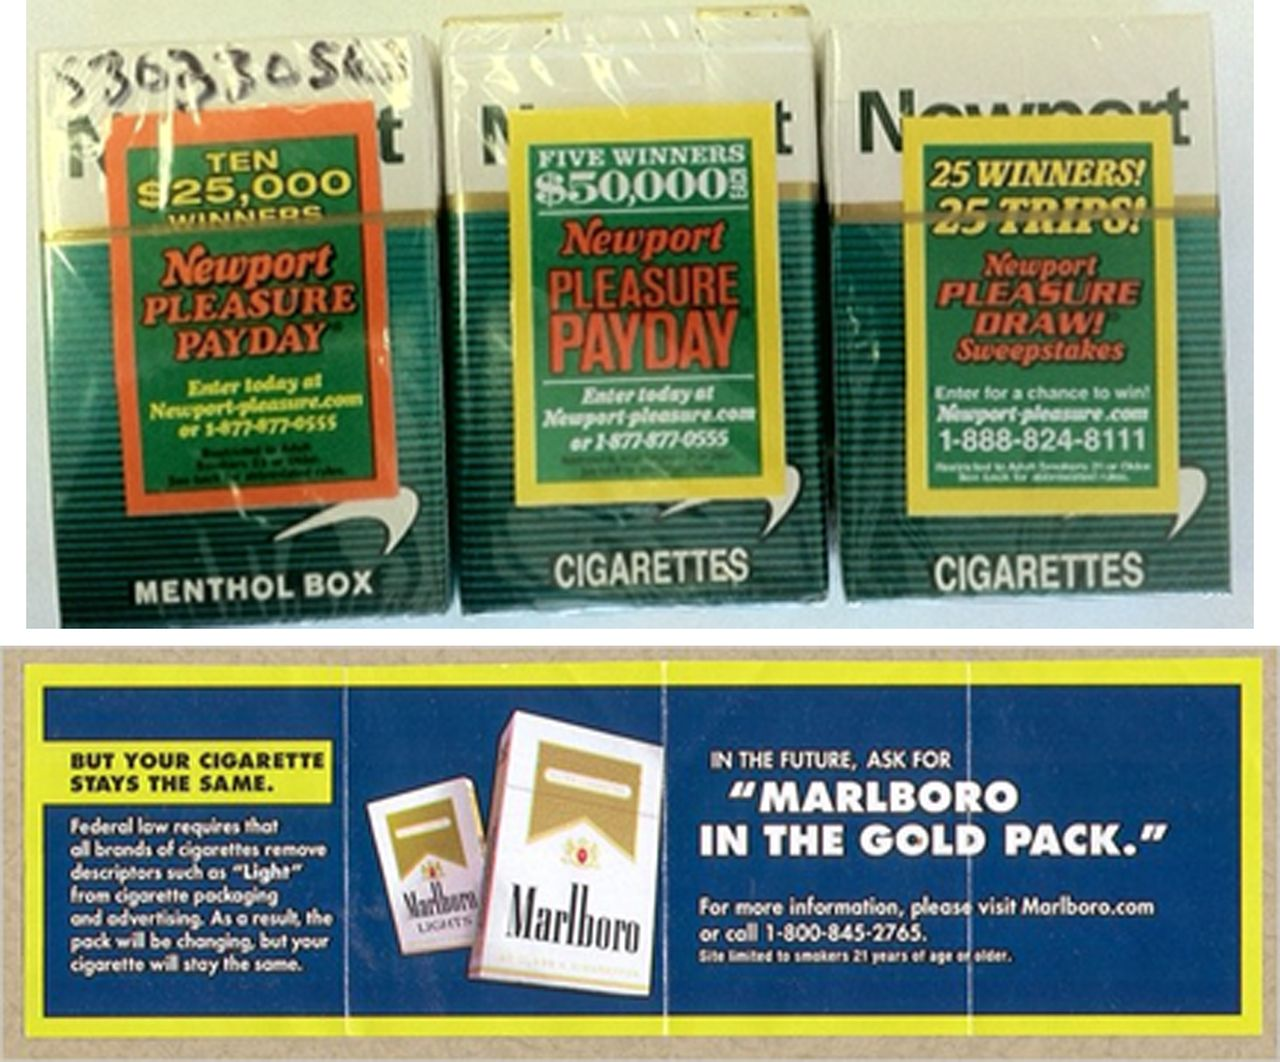 Where to buy Marlboro cigarettes in NYC